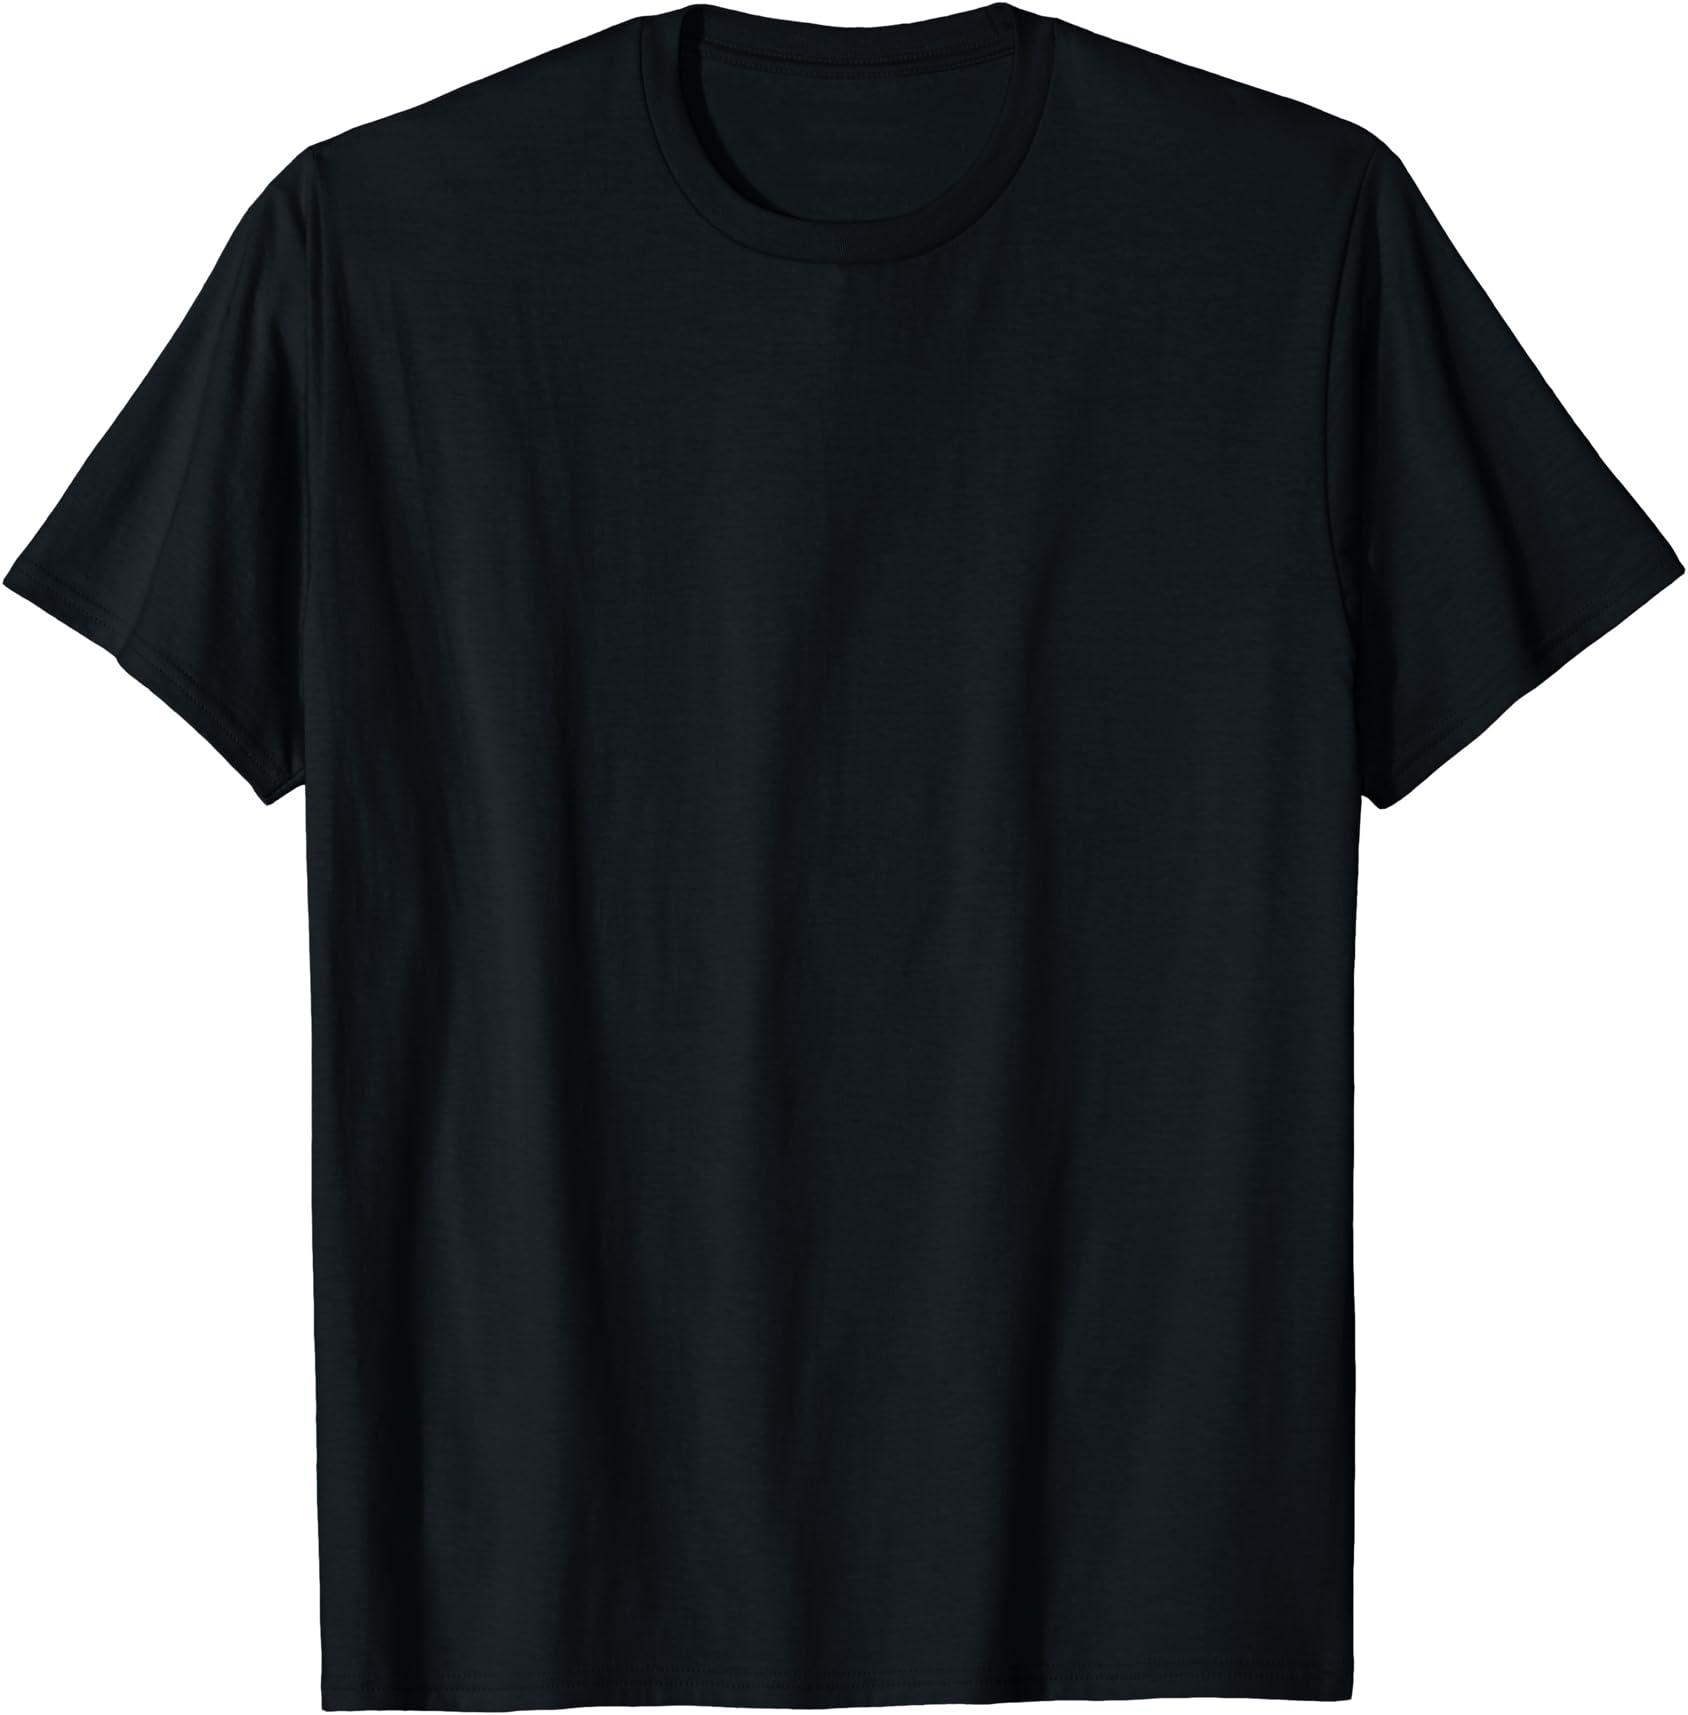 Mile End Sportswear Yonkers Track T-Shirt